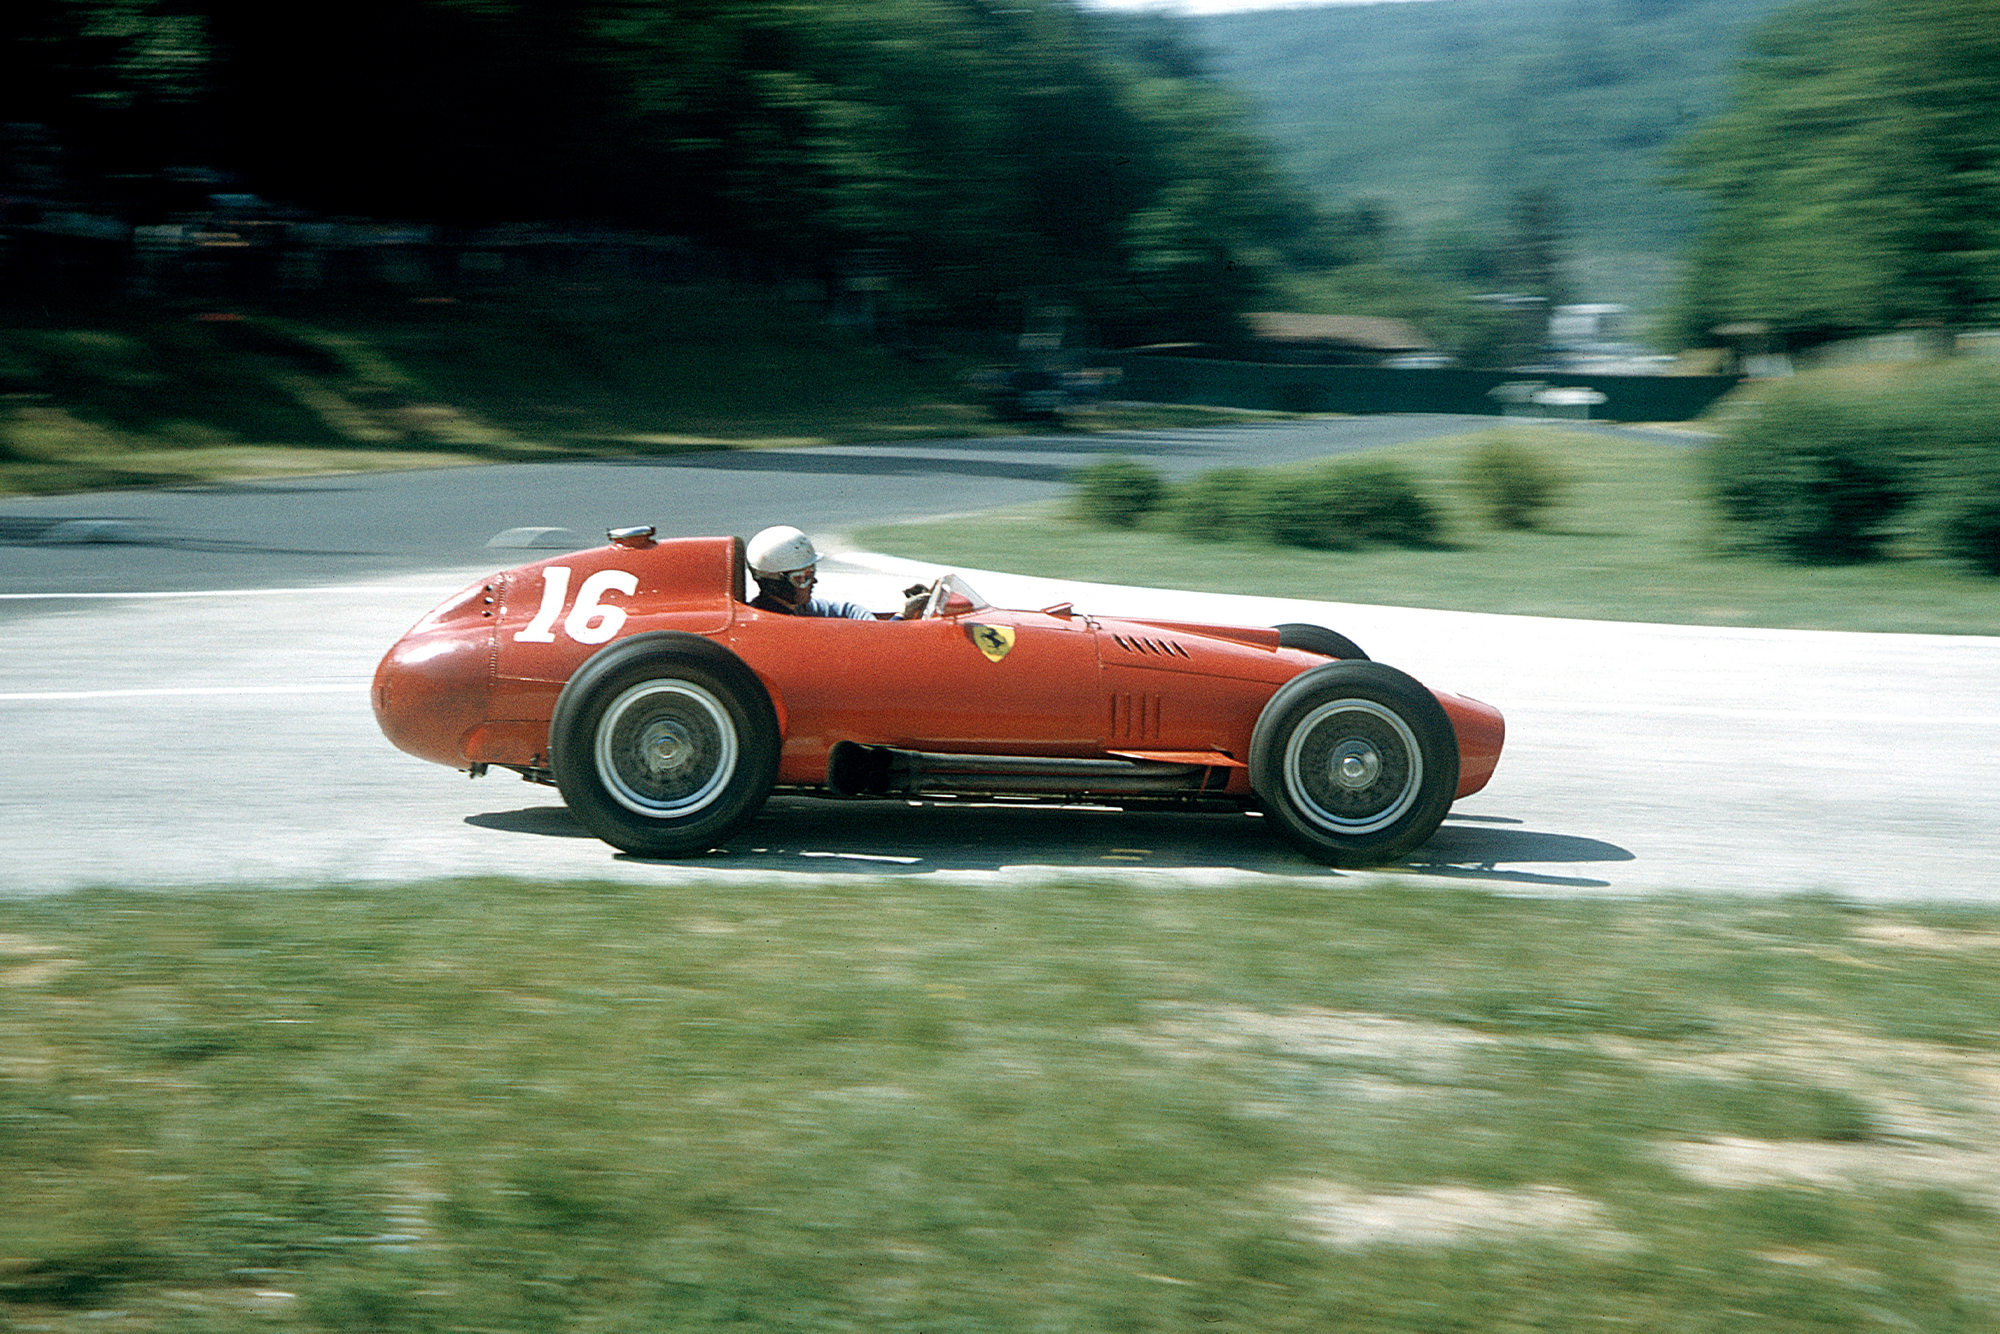 Maurice Trintignant (Lancia-Ferrari 801) takes a corner at the 1957 French Grand Prix, Rouen.